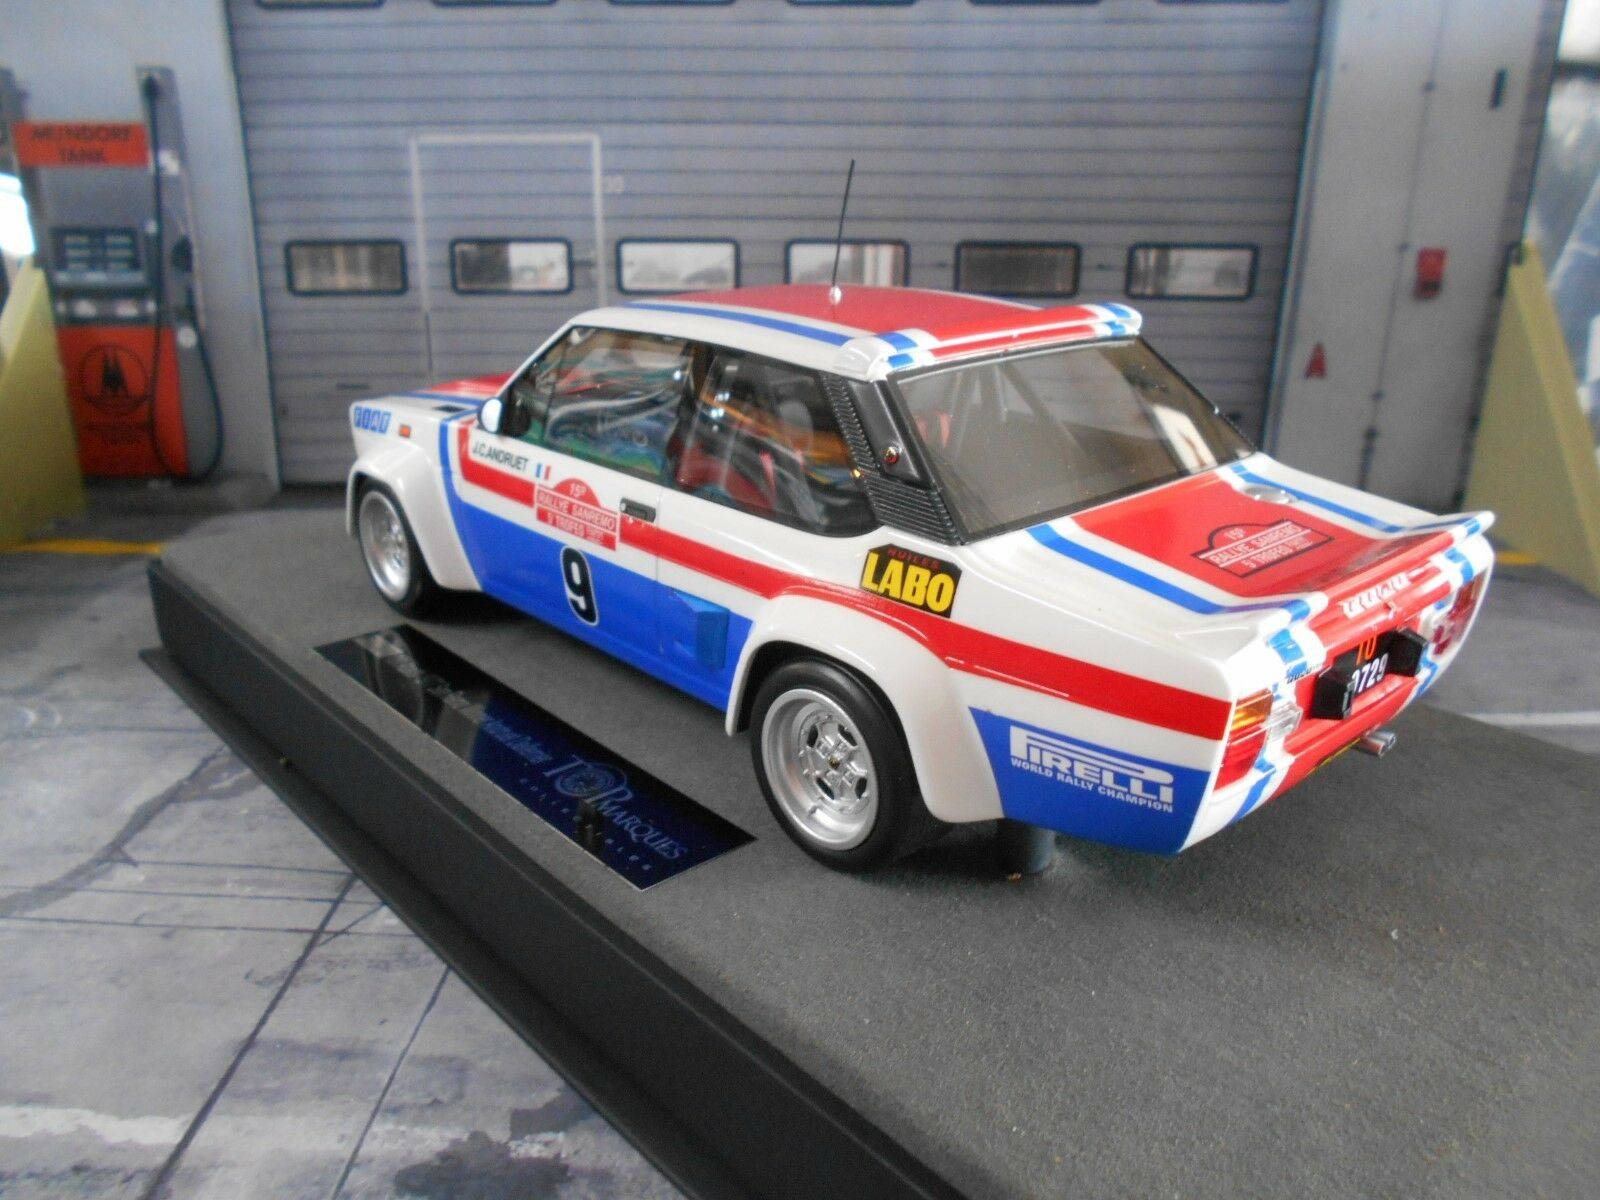 Fiat 131 Abarth Rallye San San San Remo 1977 Winner #9 Andruet vainqueur Top Marques 1:18 | Insolite  | D'ornement  | Sortie  ea0d94